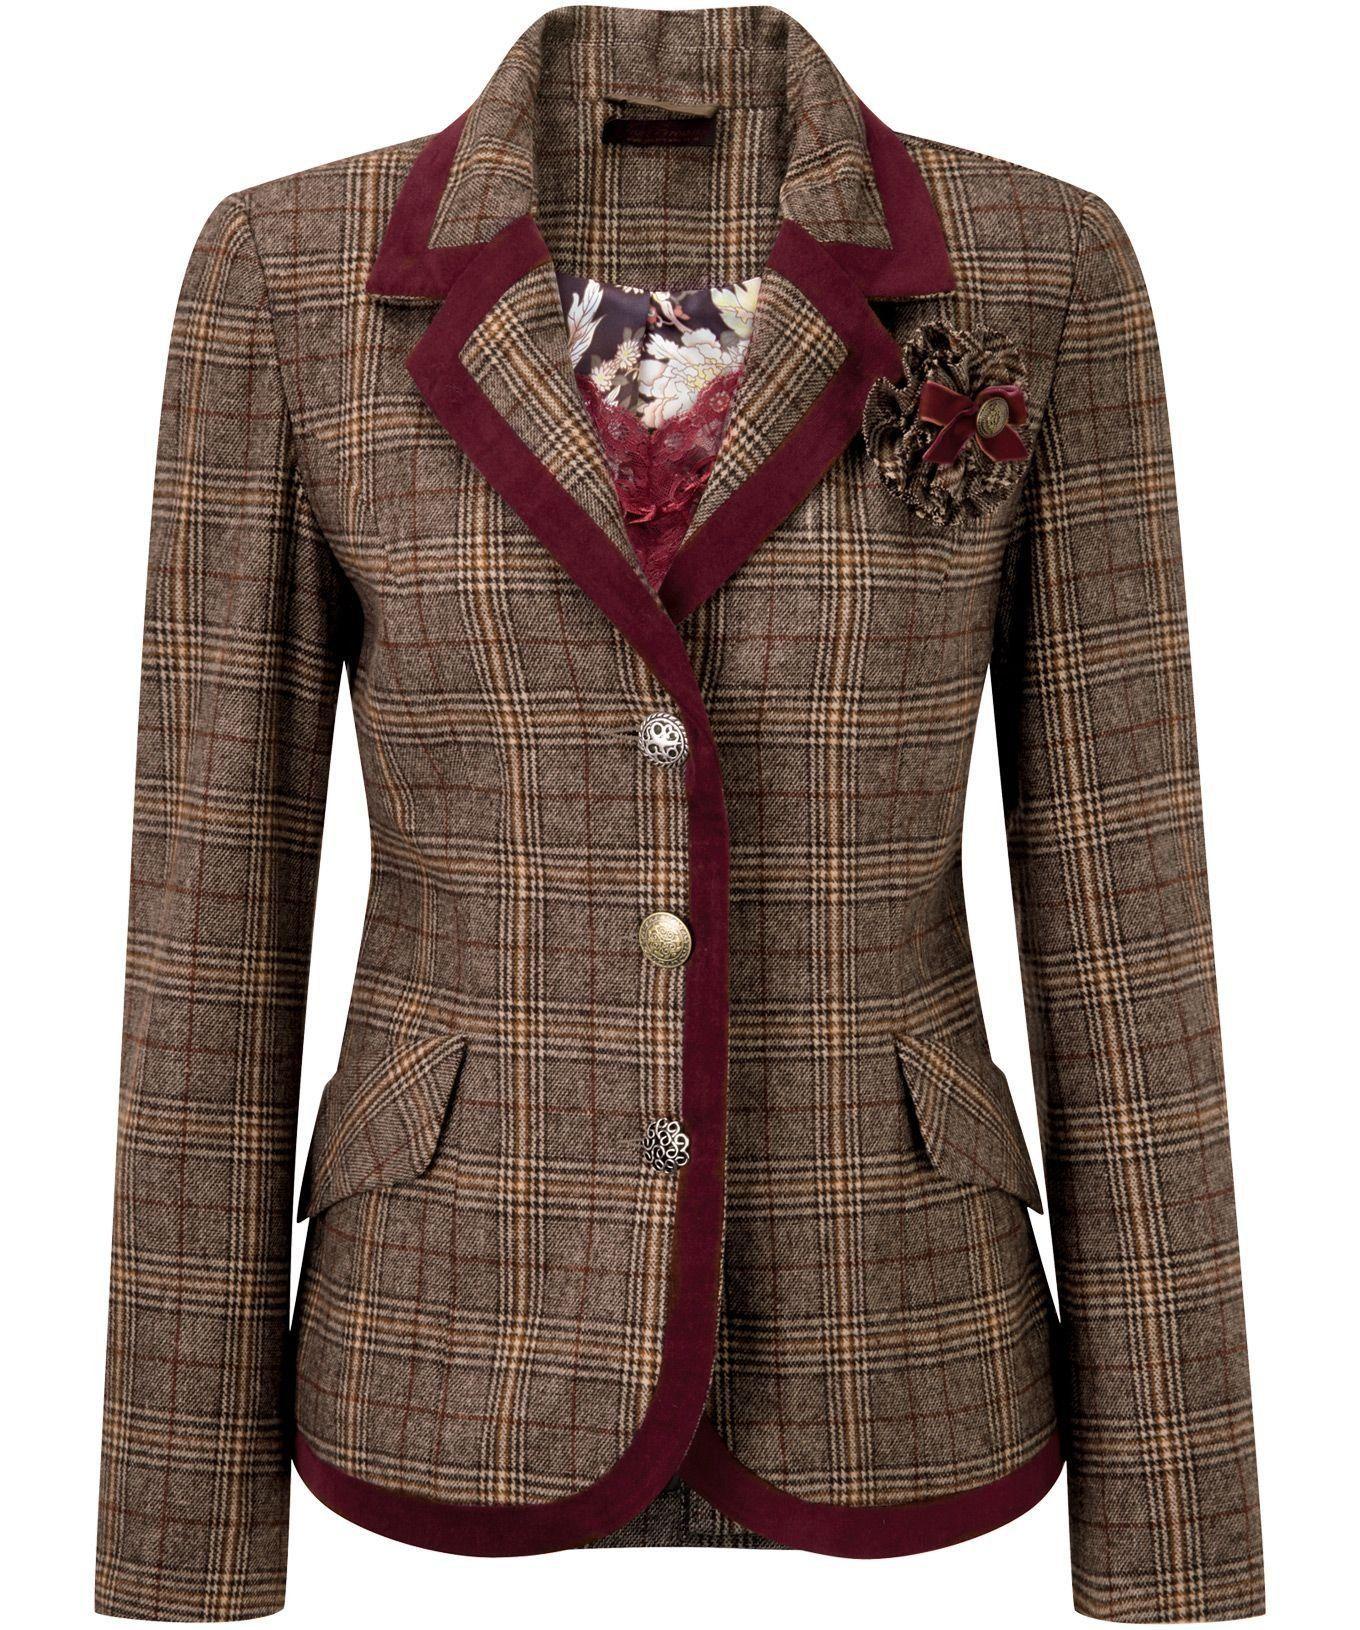 296161b440a Joe Browns Women s Sovereignty Long Sleeved Checked Blazer Jacket Check  (8)  Amazon.co.uk  Clothing